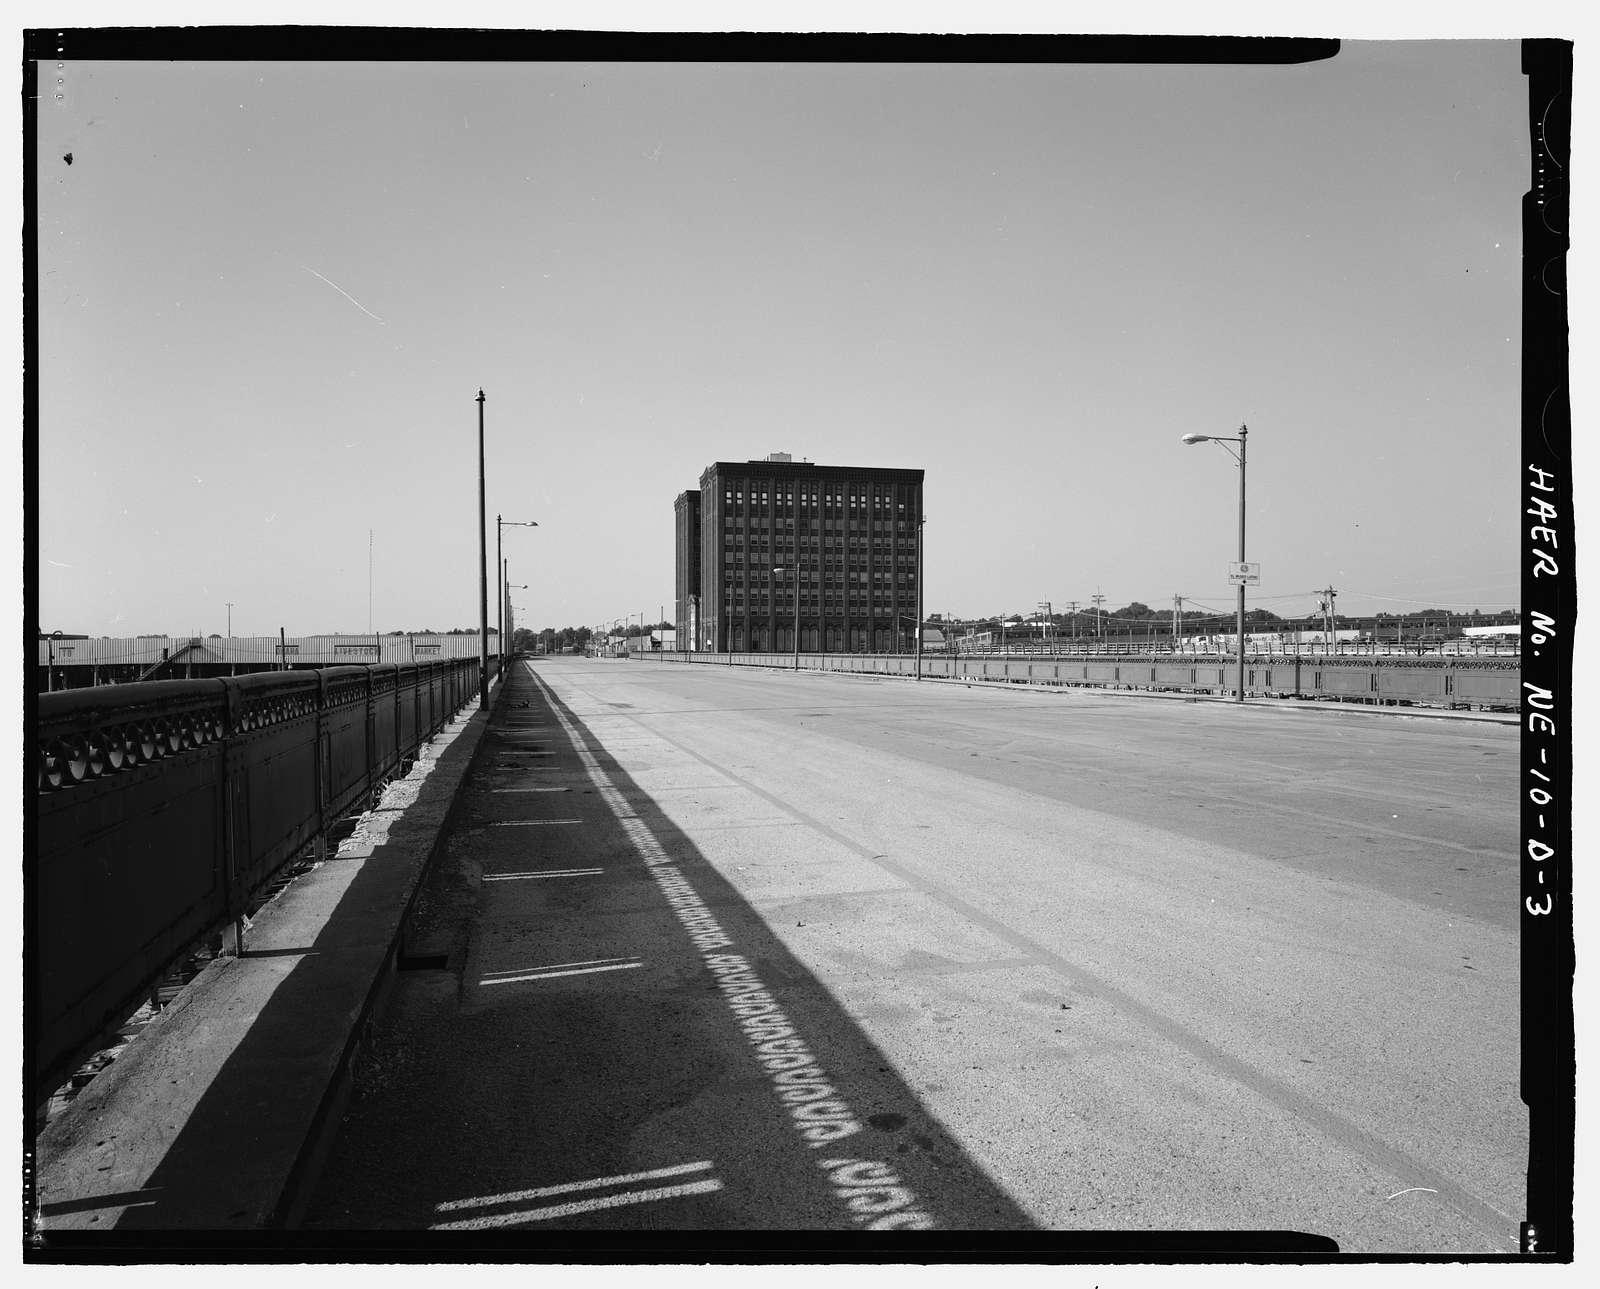 South Omaha Union Stock Yards, Buckingham Road Viaduct, Twenty-ninth Street spanning Stockyard Cattle Pens, Omaha, Douglas County, NE